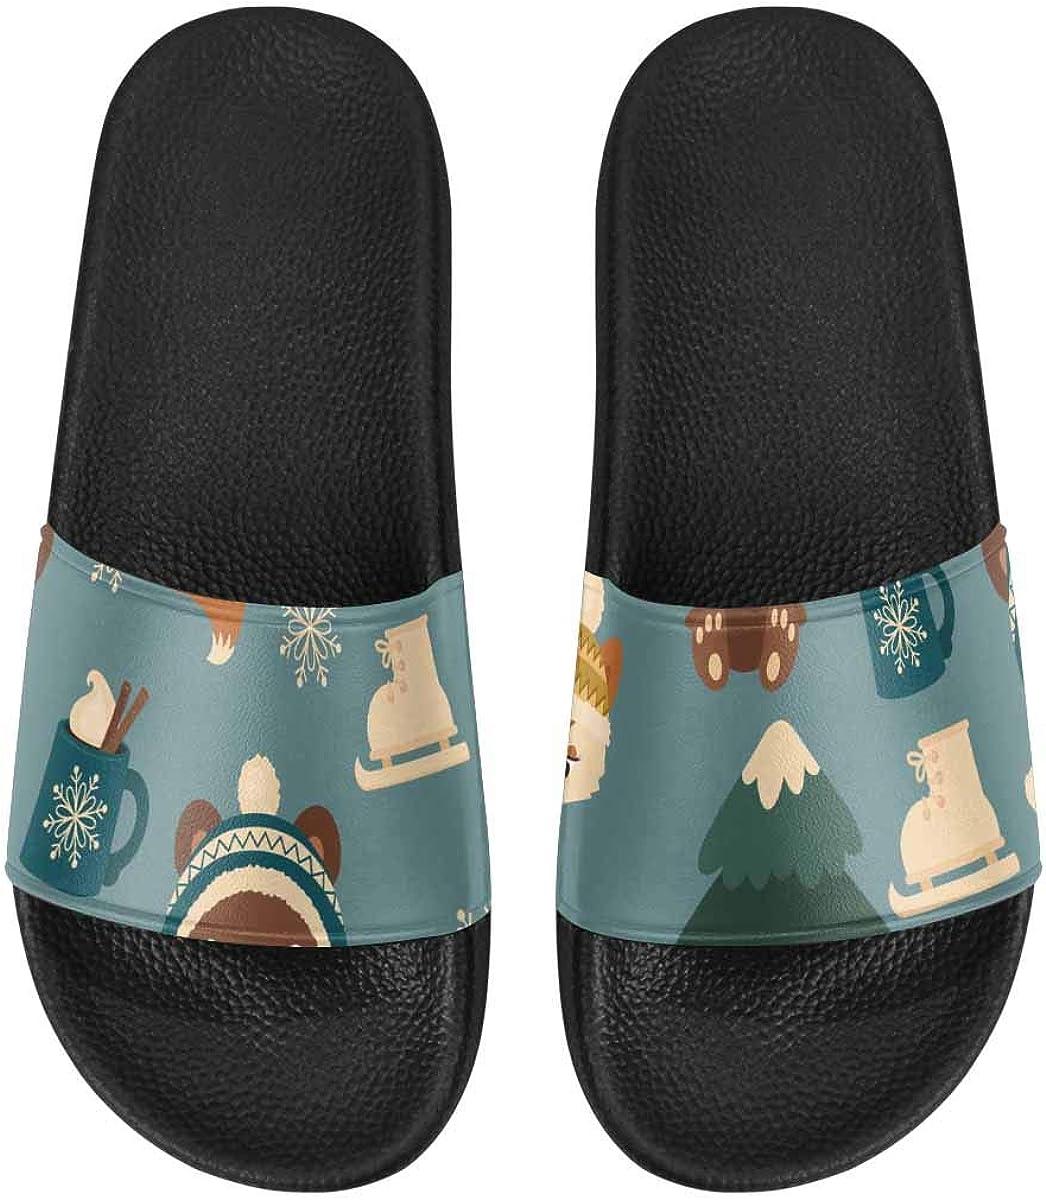 InterestPrint Outdoor Stylish Sandals Slides for Women Winter Tr